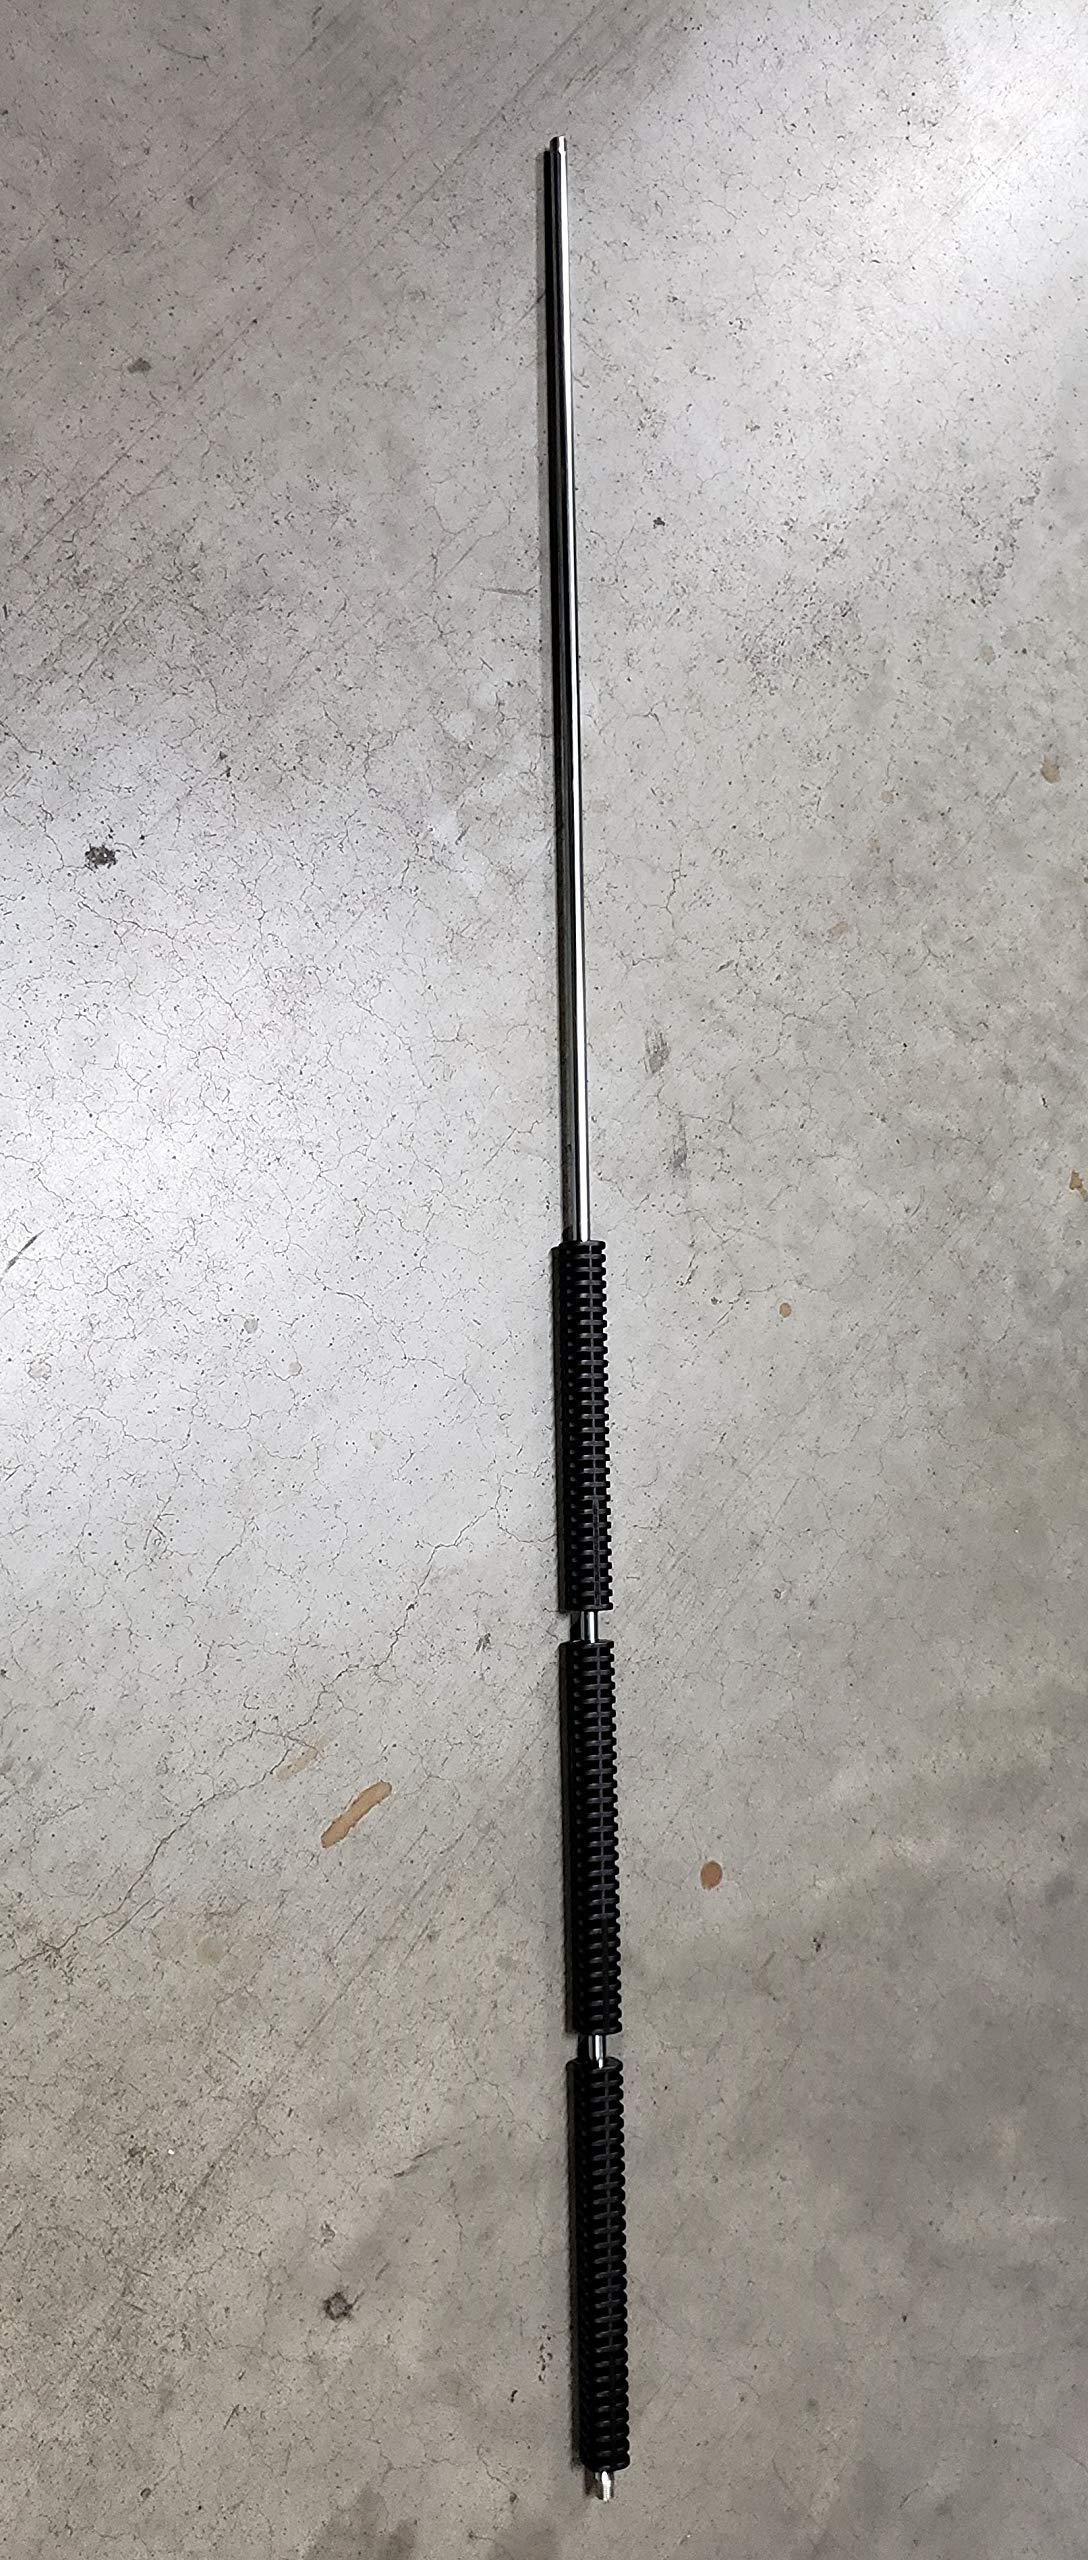 AR Annovi Reverberi AL327x Pressure Washer, Lance, Wand, 67'' Metallic